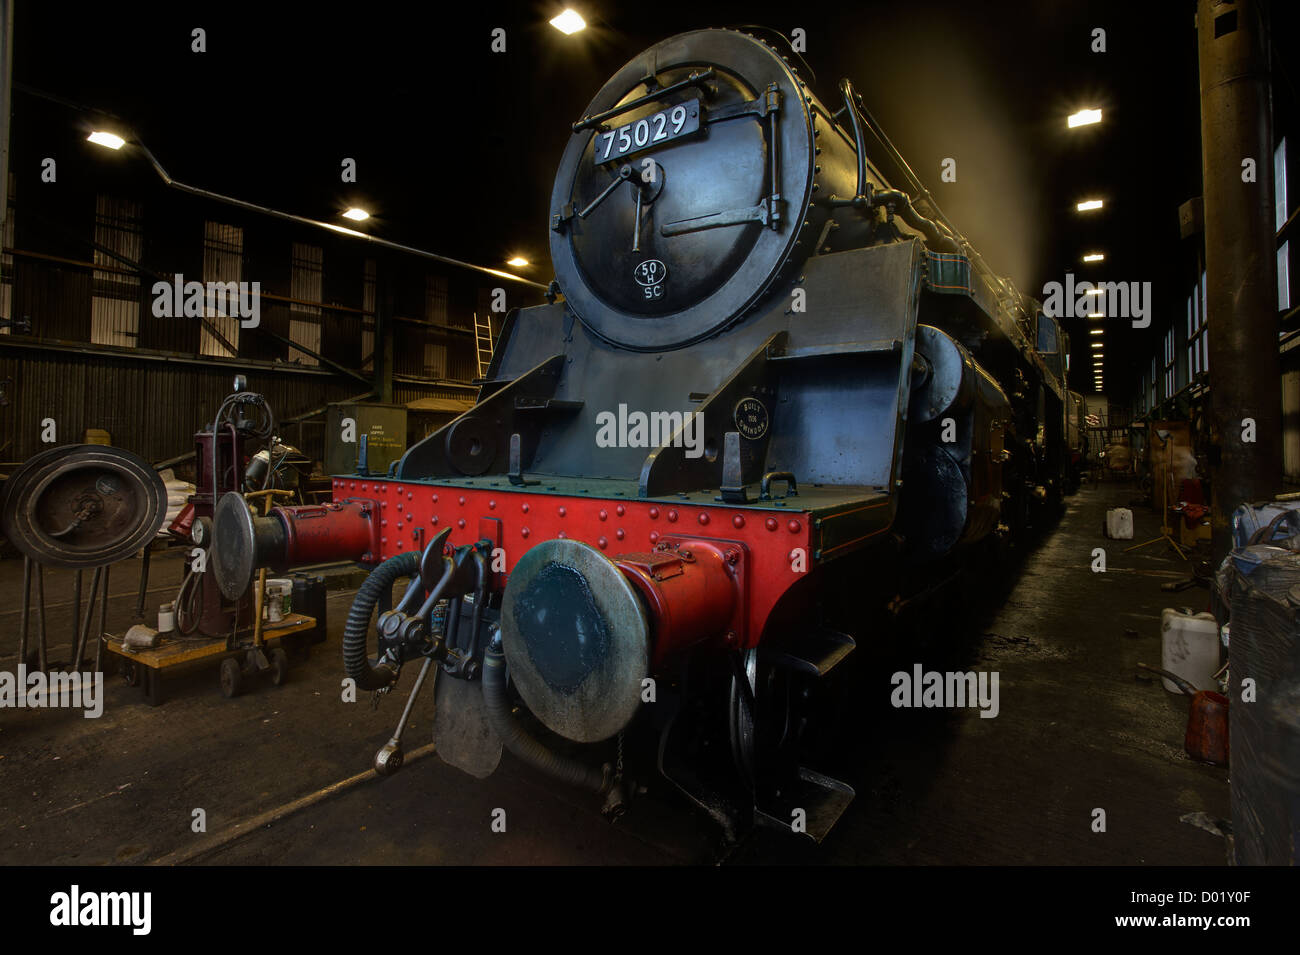 North York Moors Locomotive 75029 'The Green Knight - Stock Image